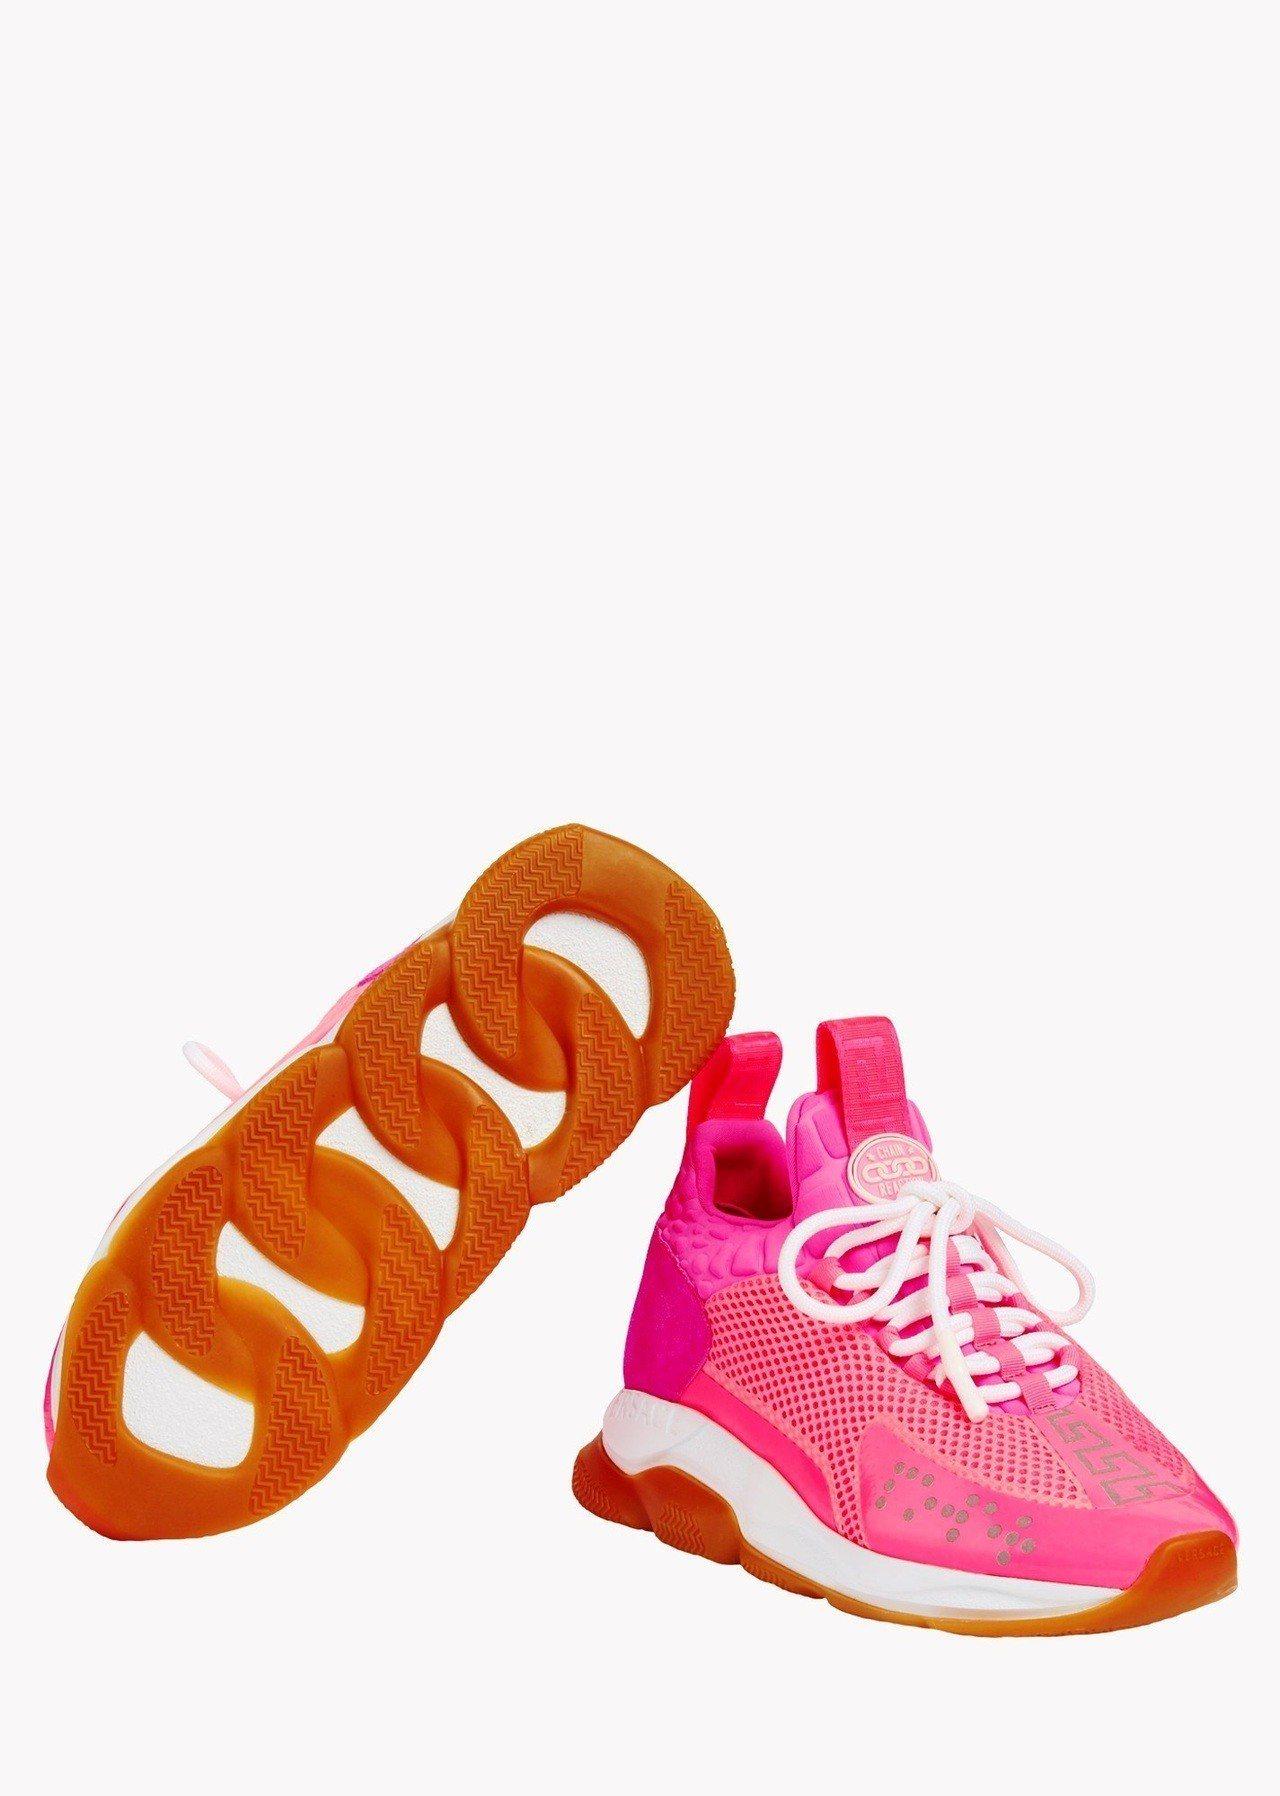 Cross Chainer螢光紅運動鞋,主打鍊飾狀鞋底,26,500元。圖/Ve...